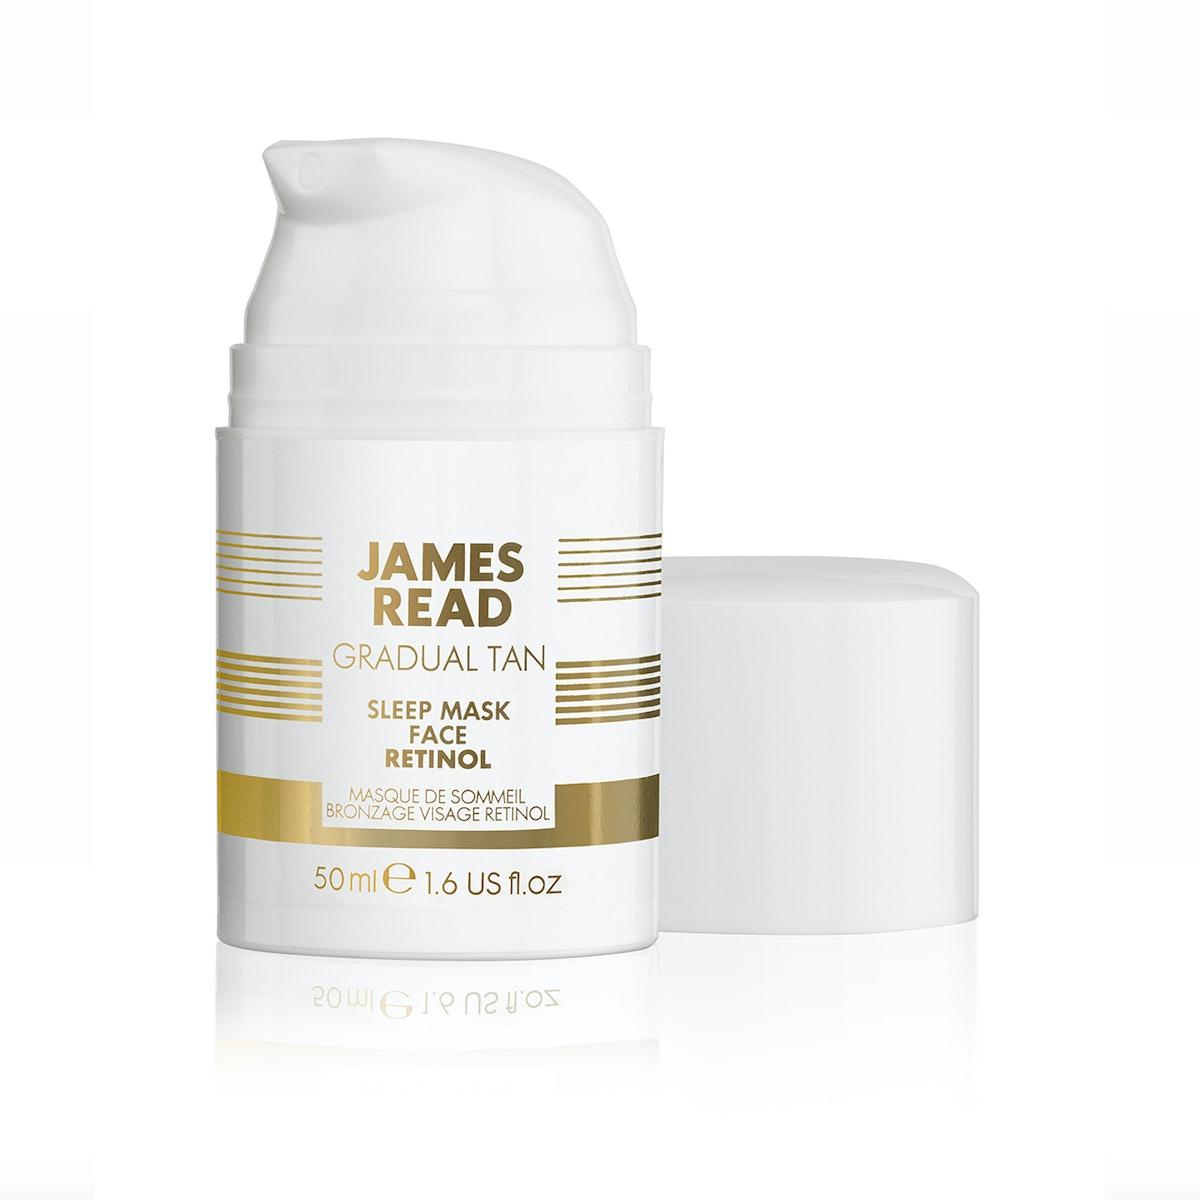 James Read Sleep Mask Face Retinol